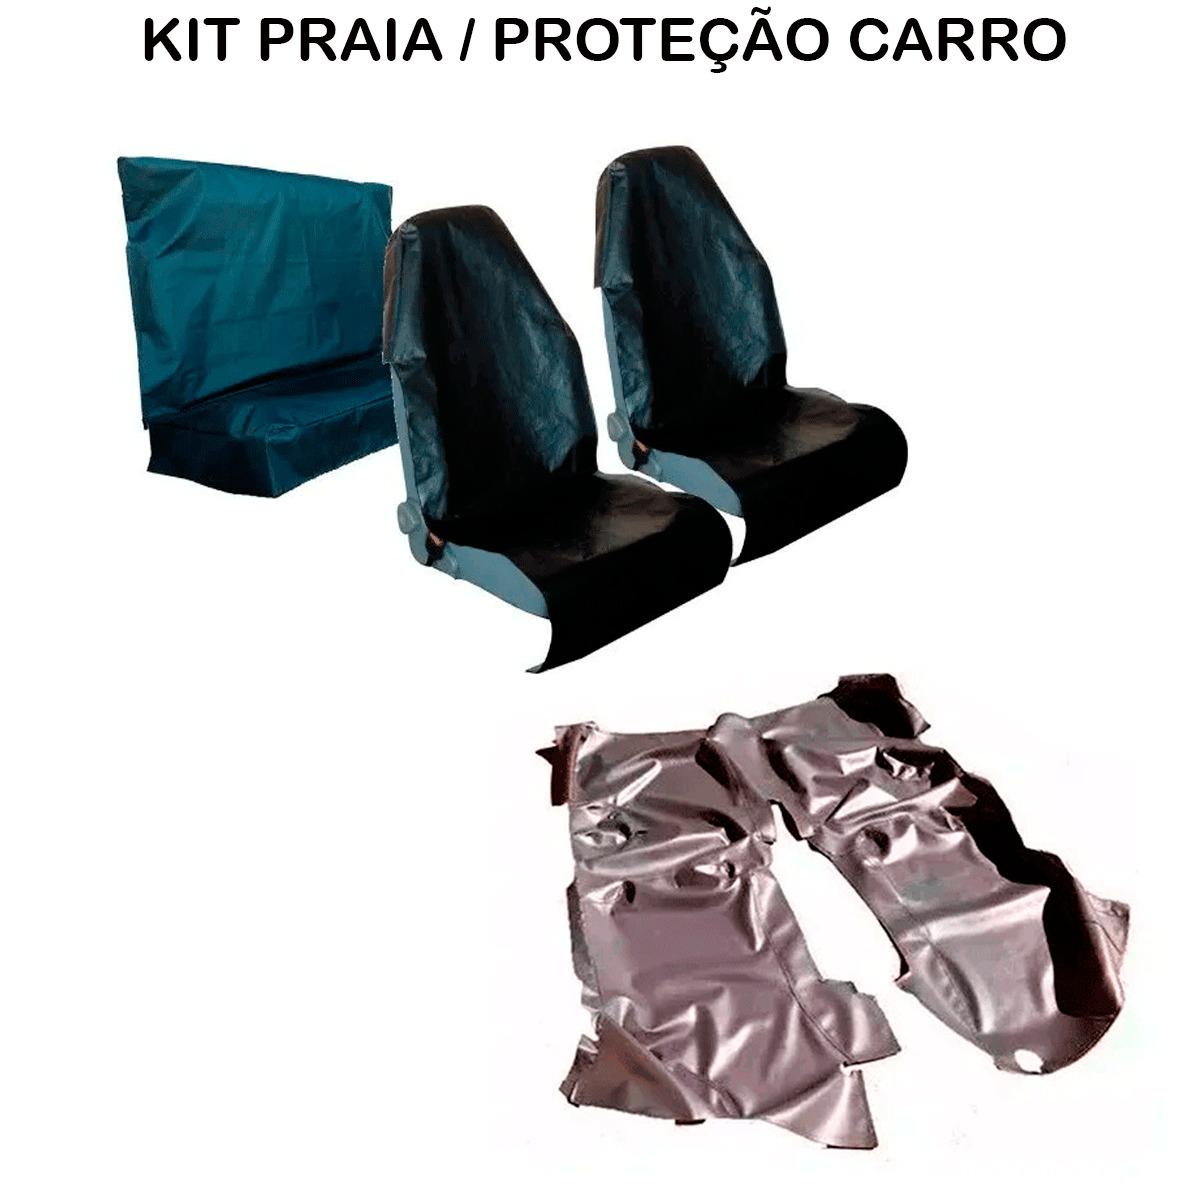 Tapete Em Vinil Renault Sandero 2015 a 2020 + Capa Banco Protecao Banco Areia Suor Academia